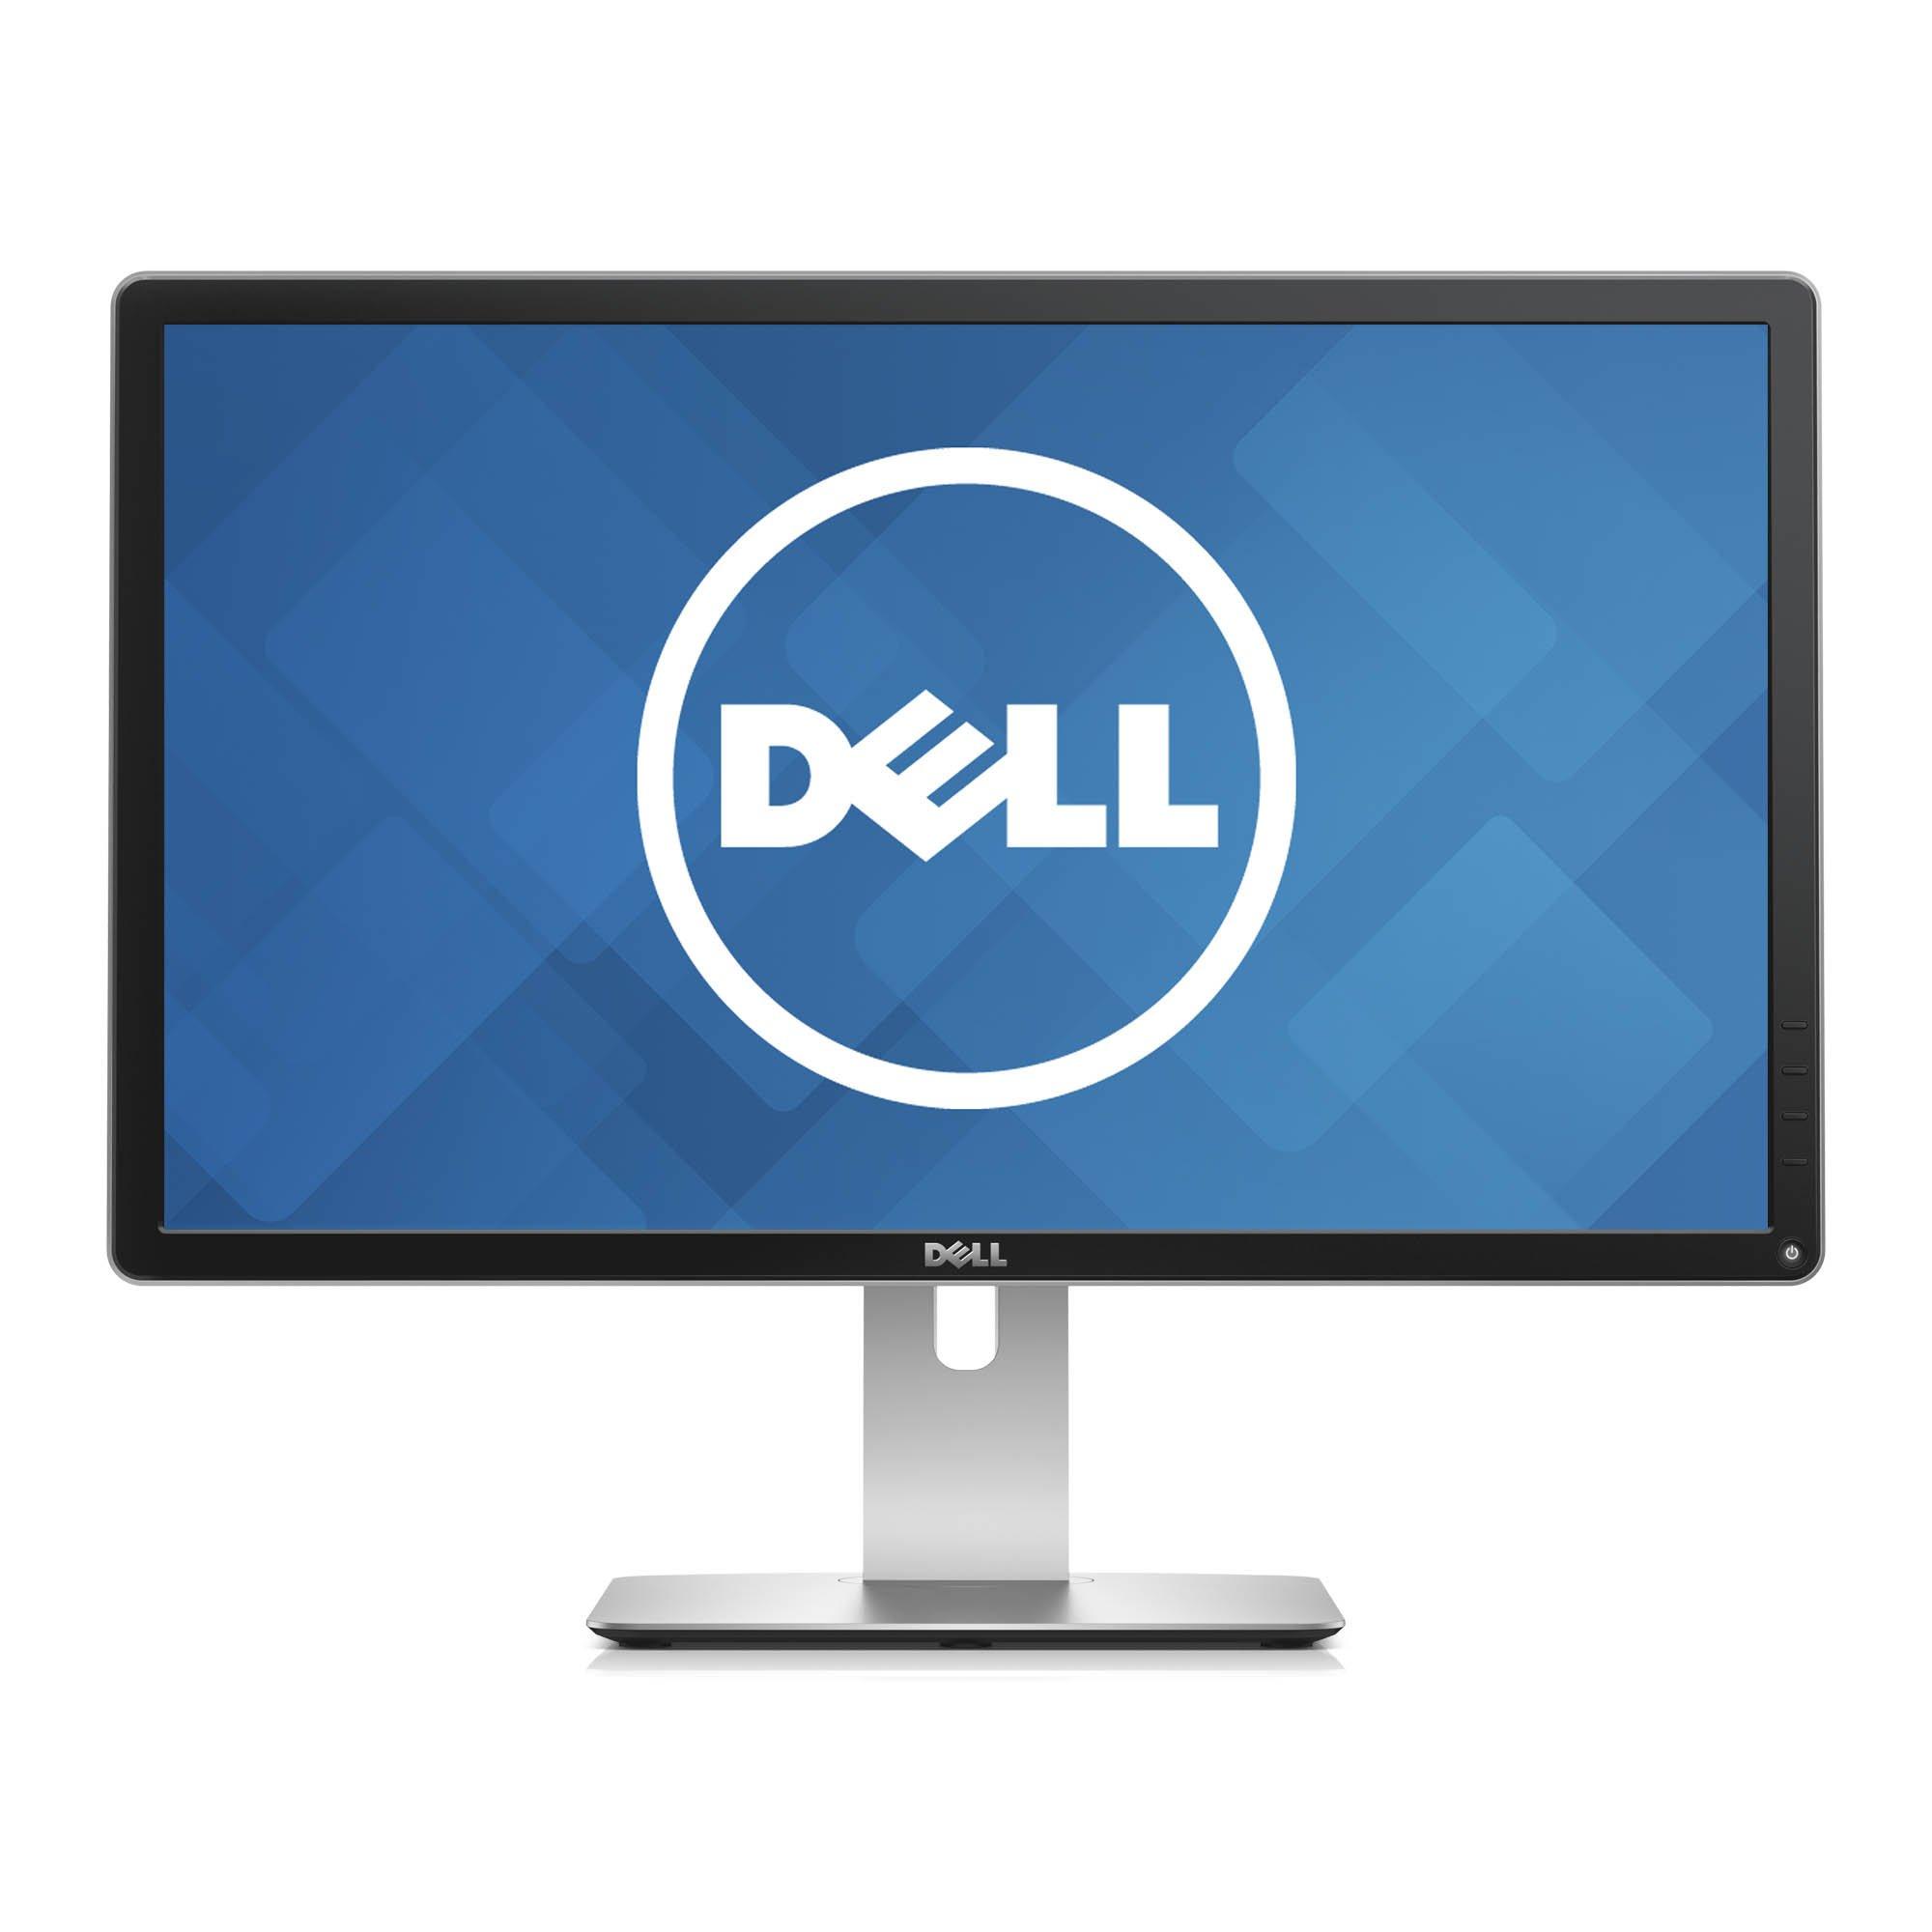 "Dell P2415q 23.8"" Edge Led Lcd Monitor - 16:9 - 8 Ms - 3840 X 2160 - 1.07 Billion Colors - 300 Nit - 2,000,000:1 - 4k Uhd - Hdmi - Displayport - Usb - 90 W - Black - Energy Star, Epeat Gold, (p2415q)"